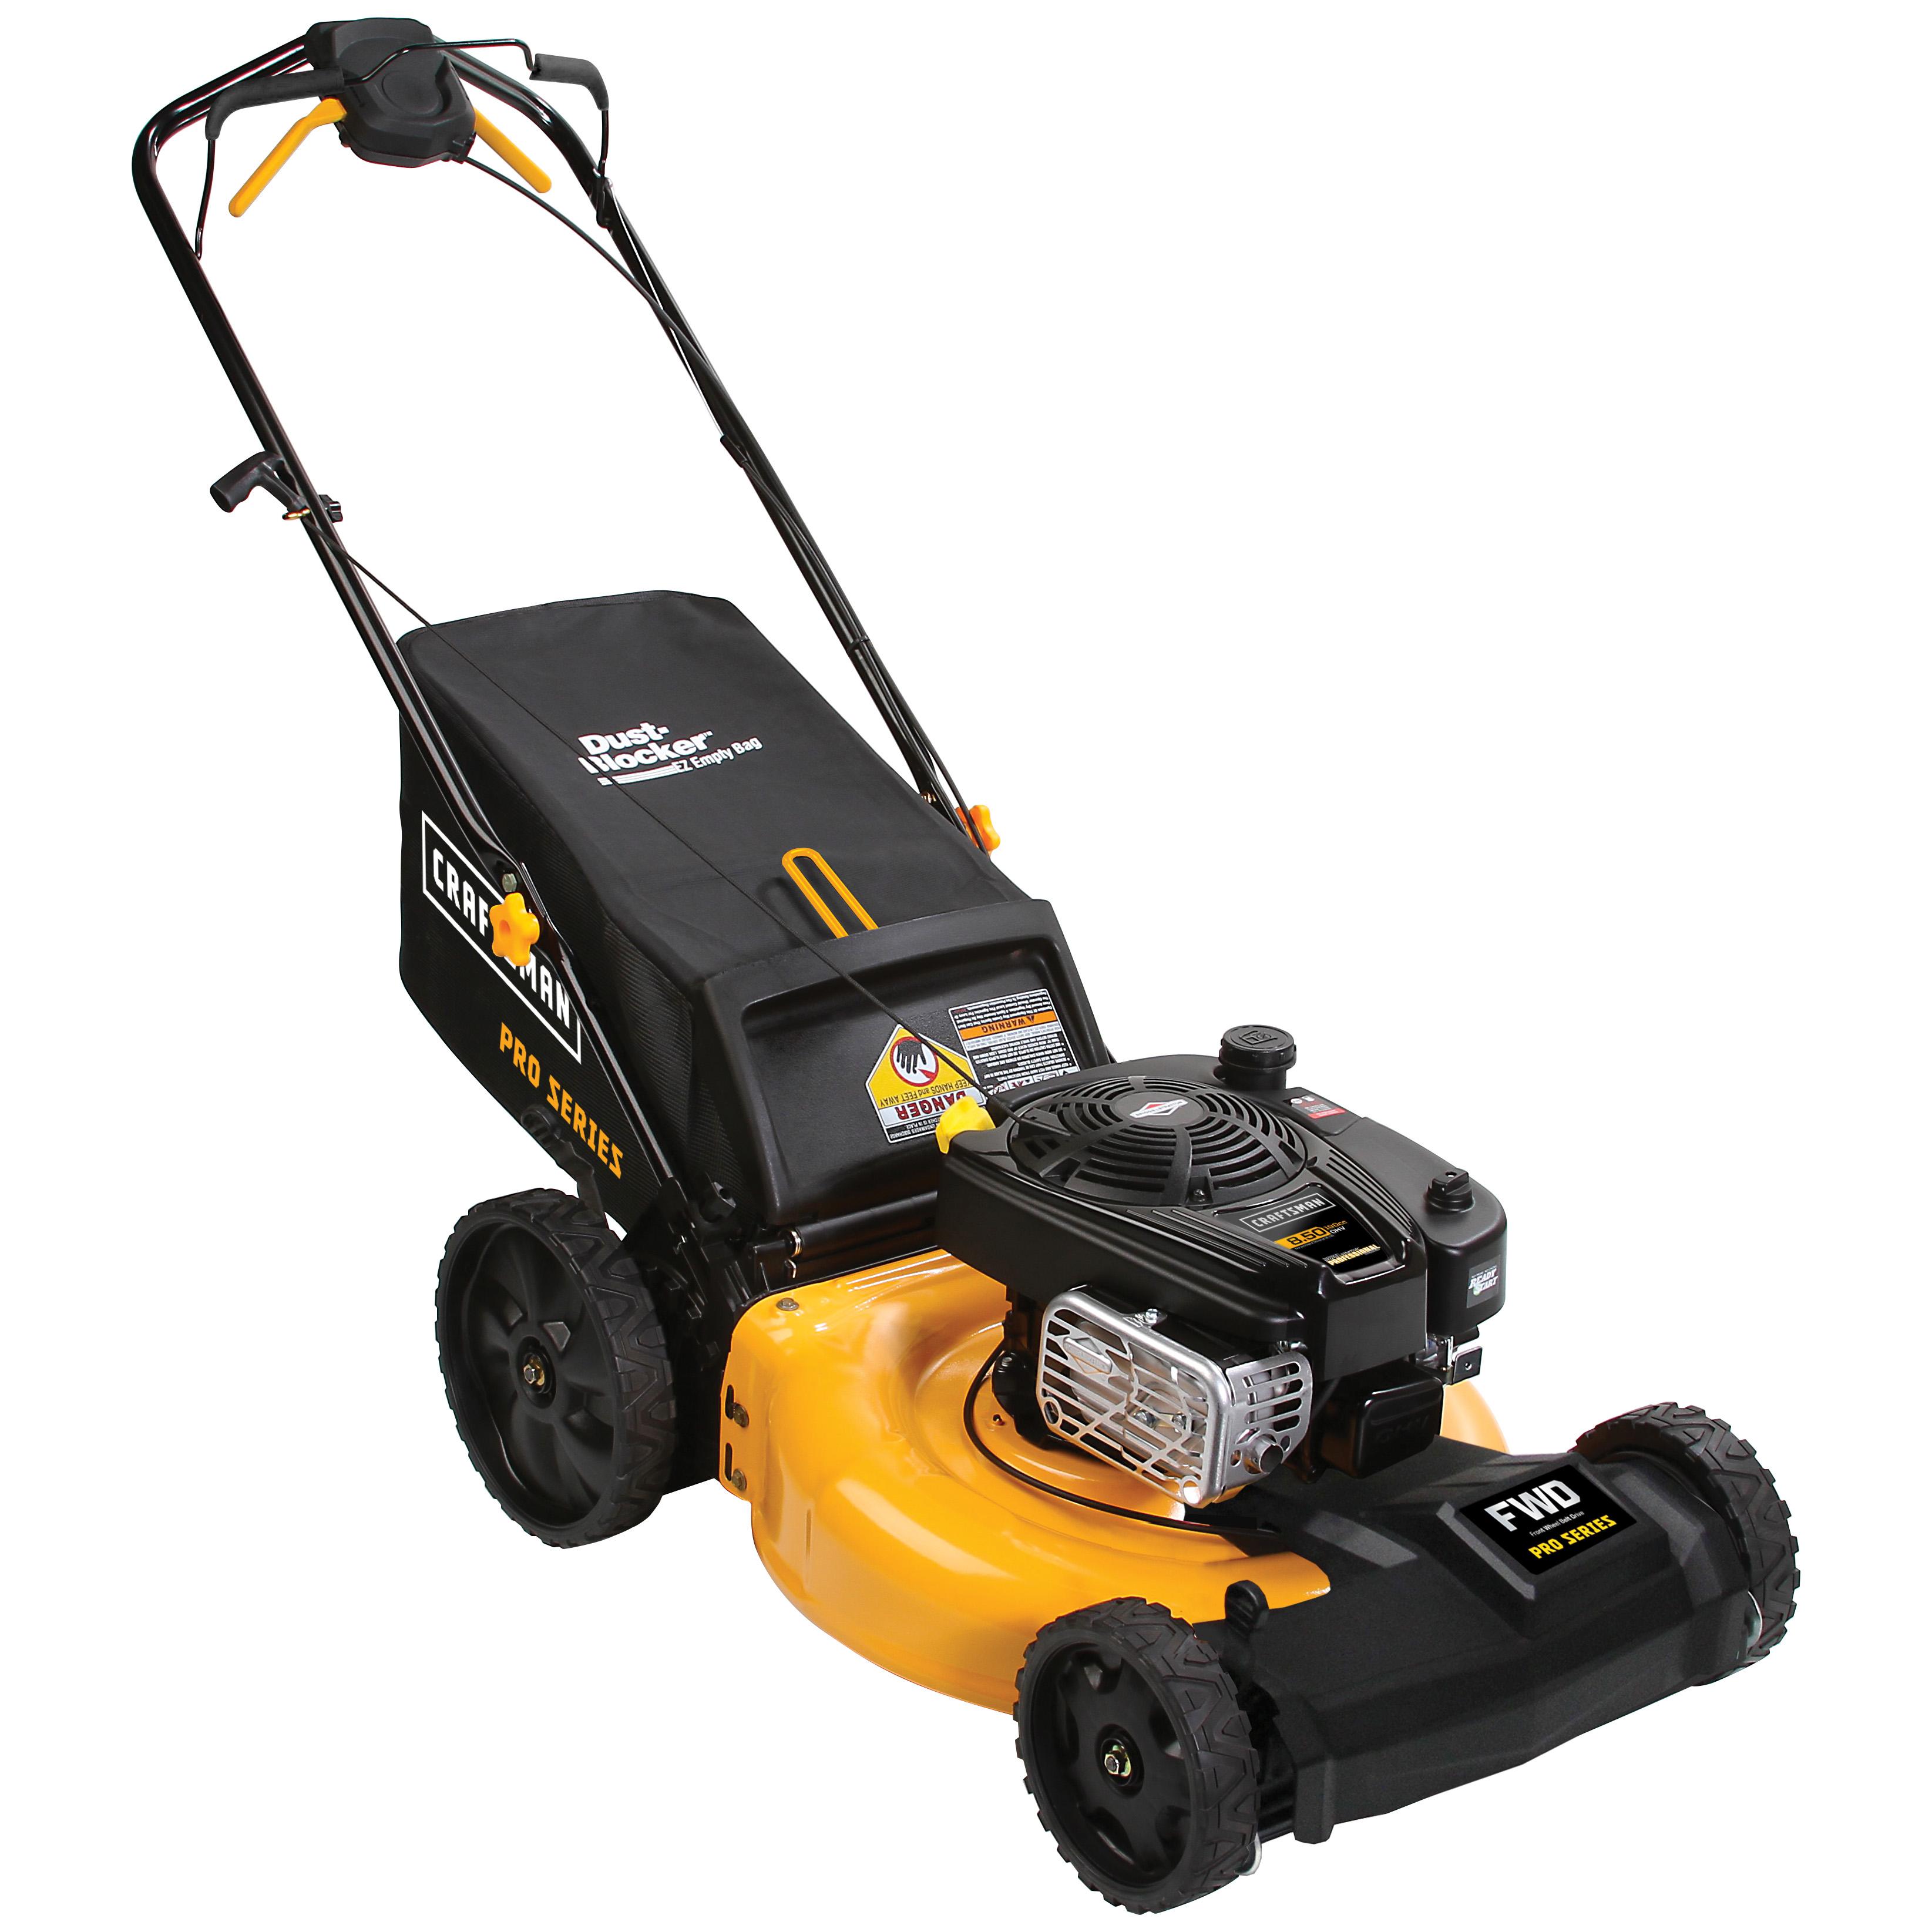 craftsman proseries 39760 21 190cc front wheel drive lawn mower  [ 3289 x 3289 Pixel ]